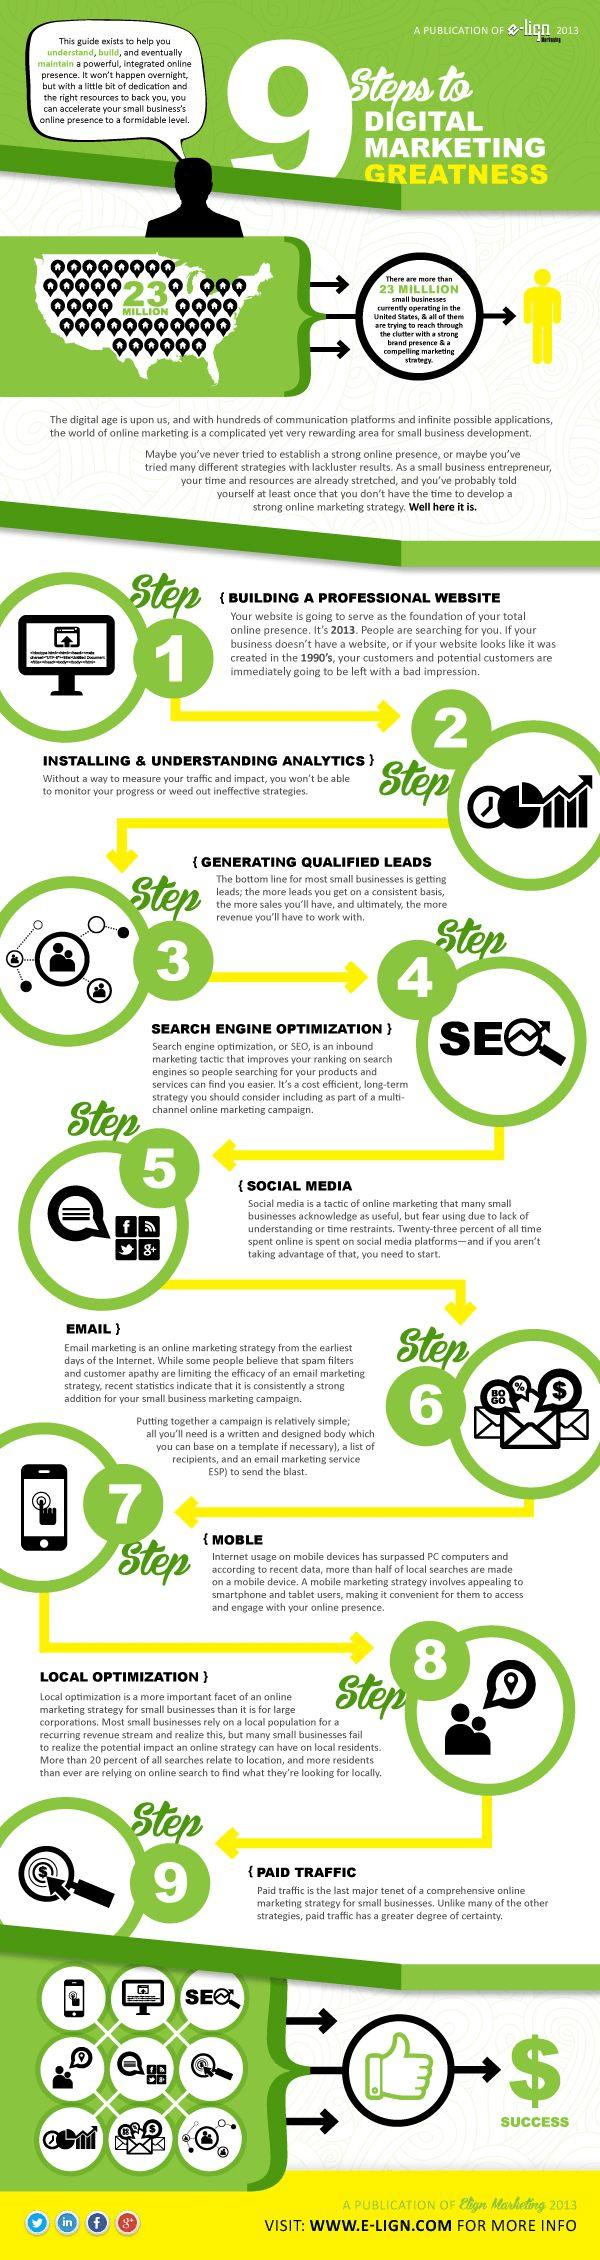 9 Steps to Internet Marketing Greatness